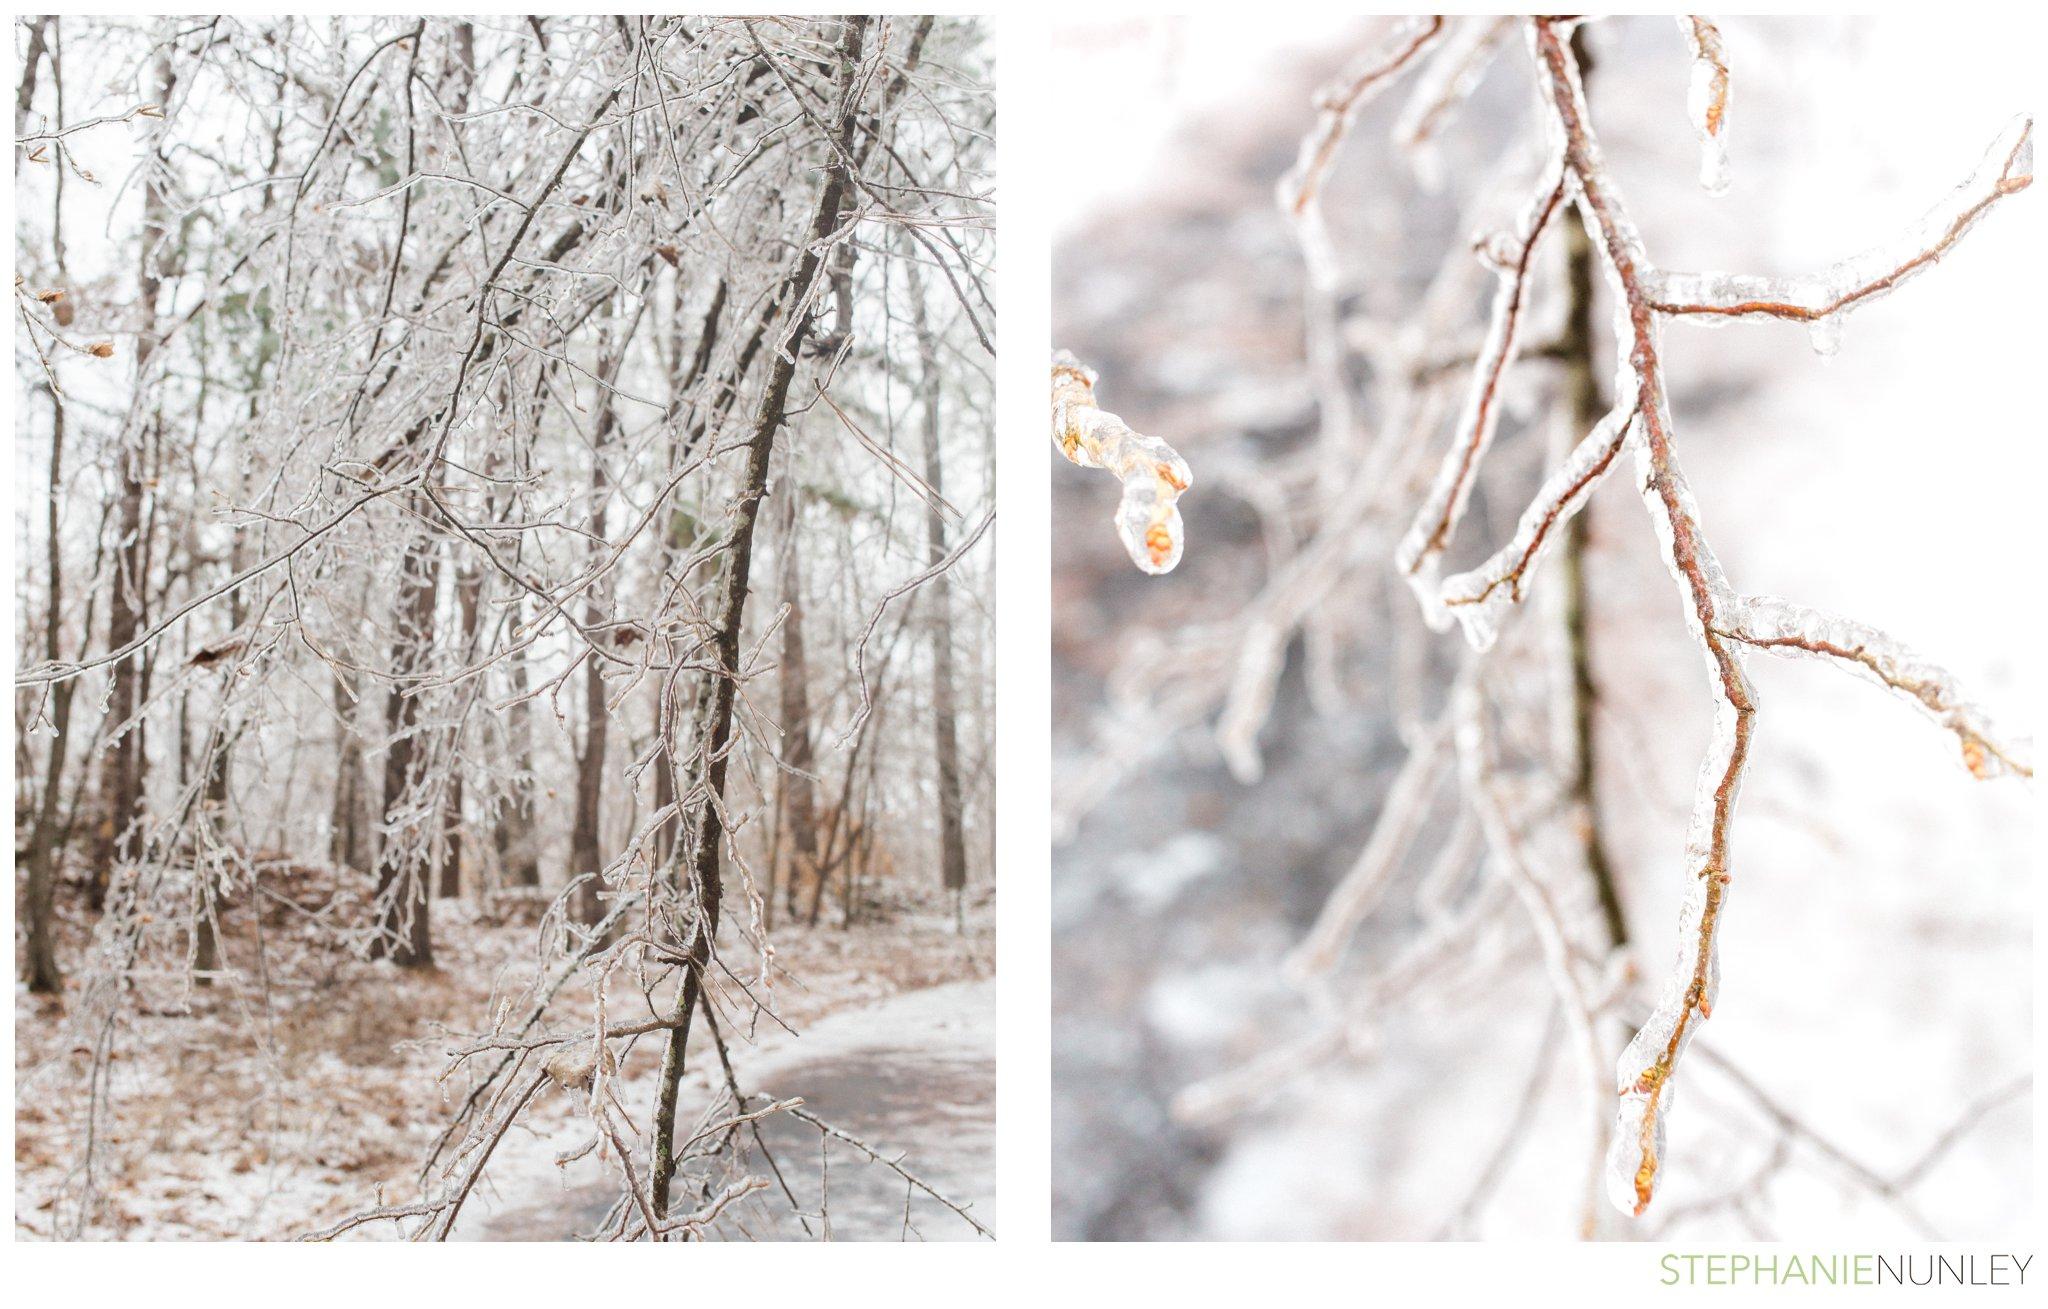 arkansas-winter-scenery-006.jpg